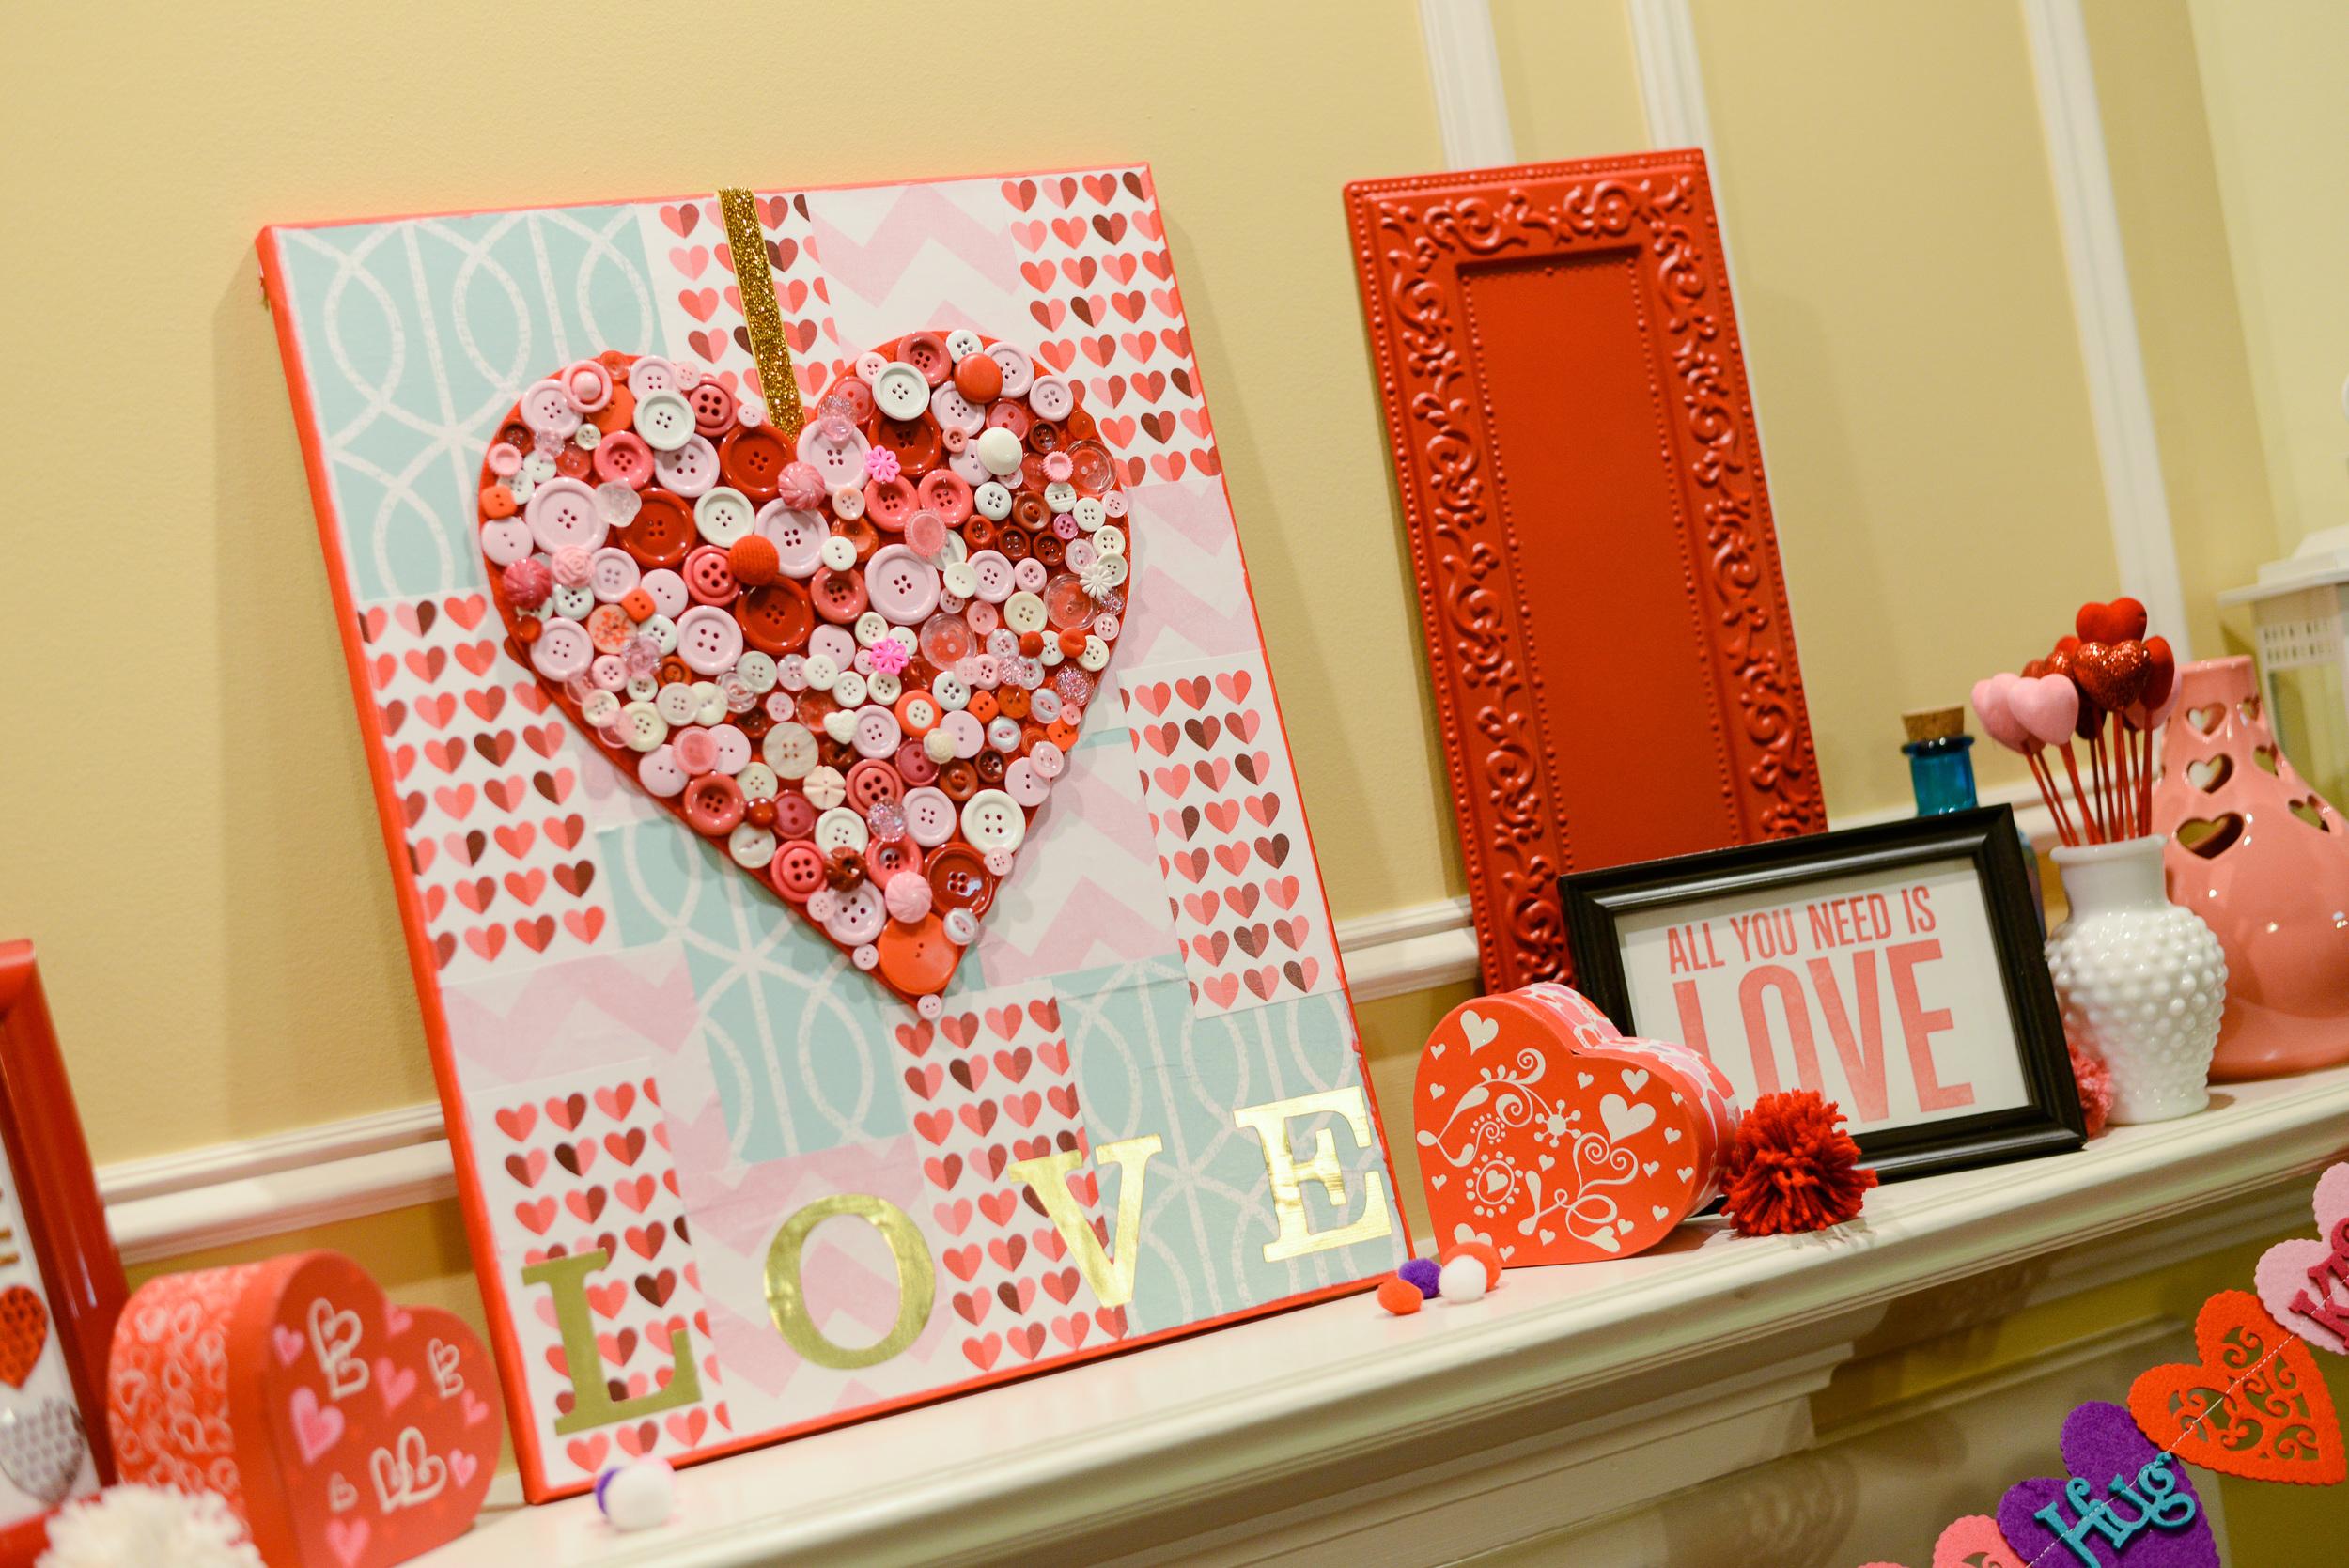 Holiday Home Decor Love Canvas Me My Big Ideas